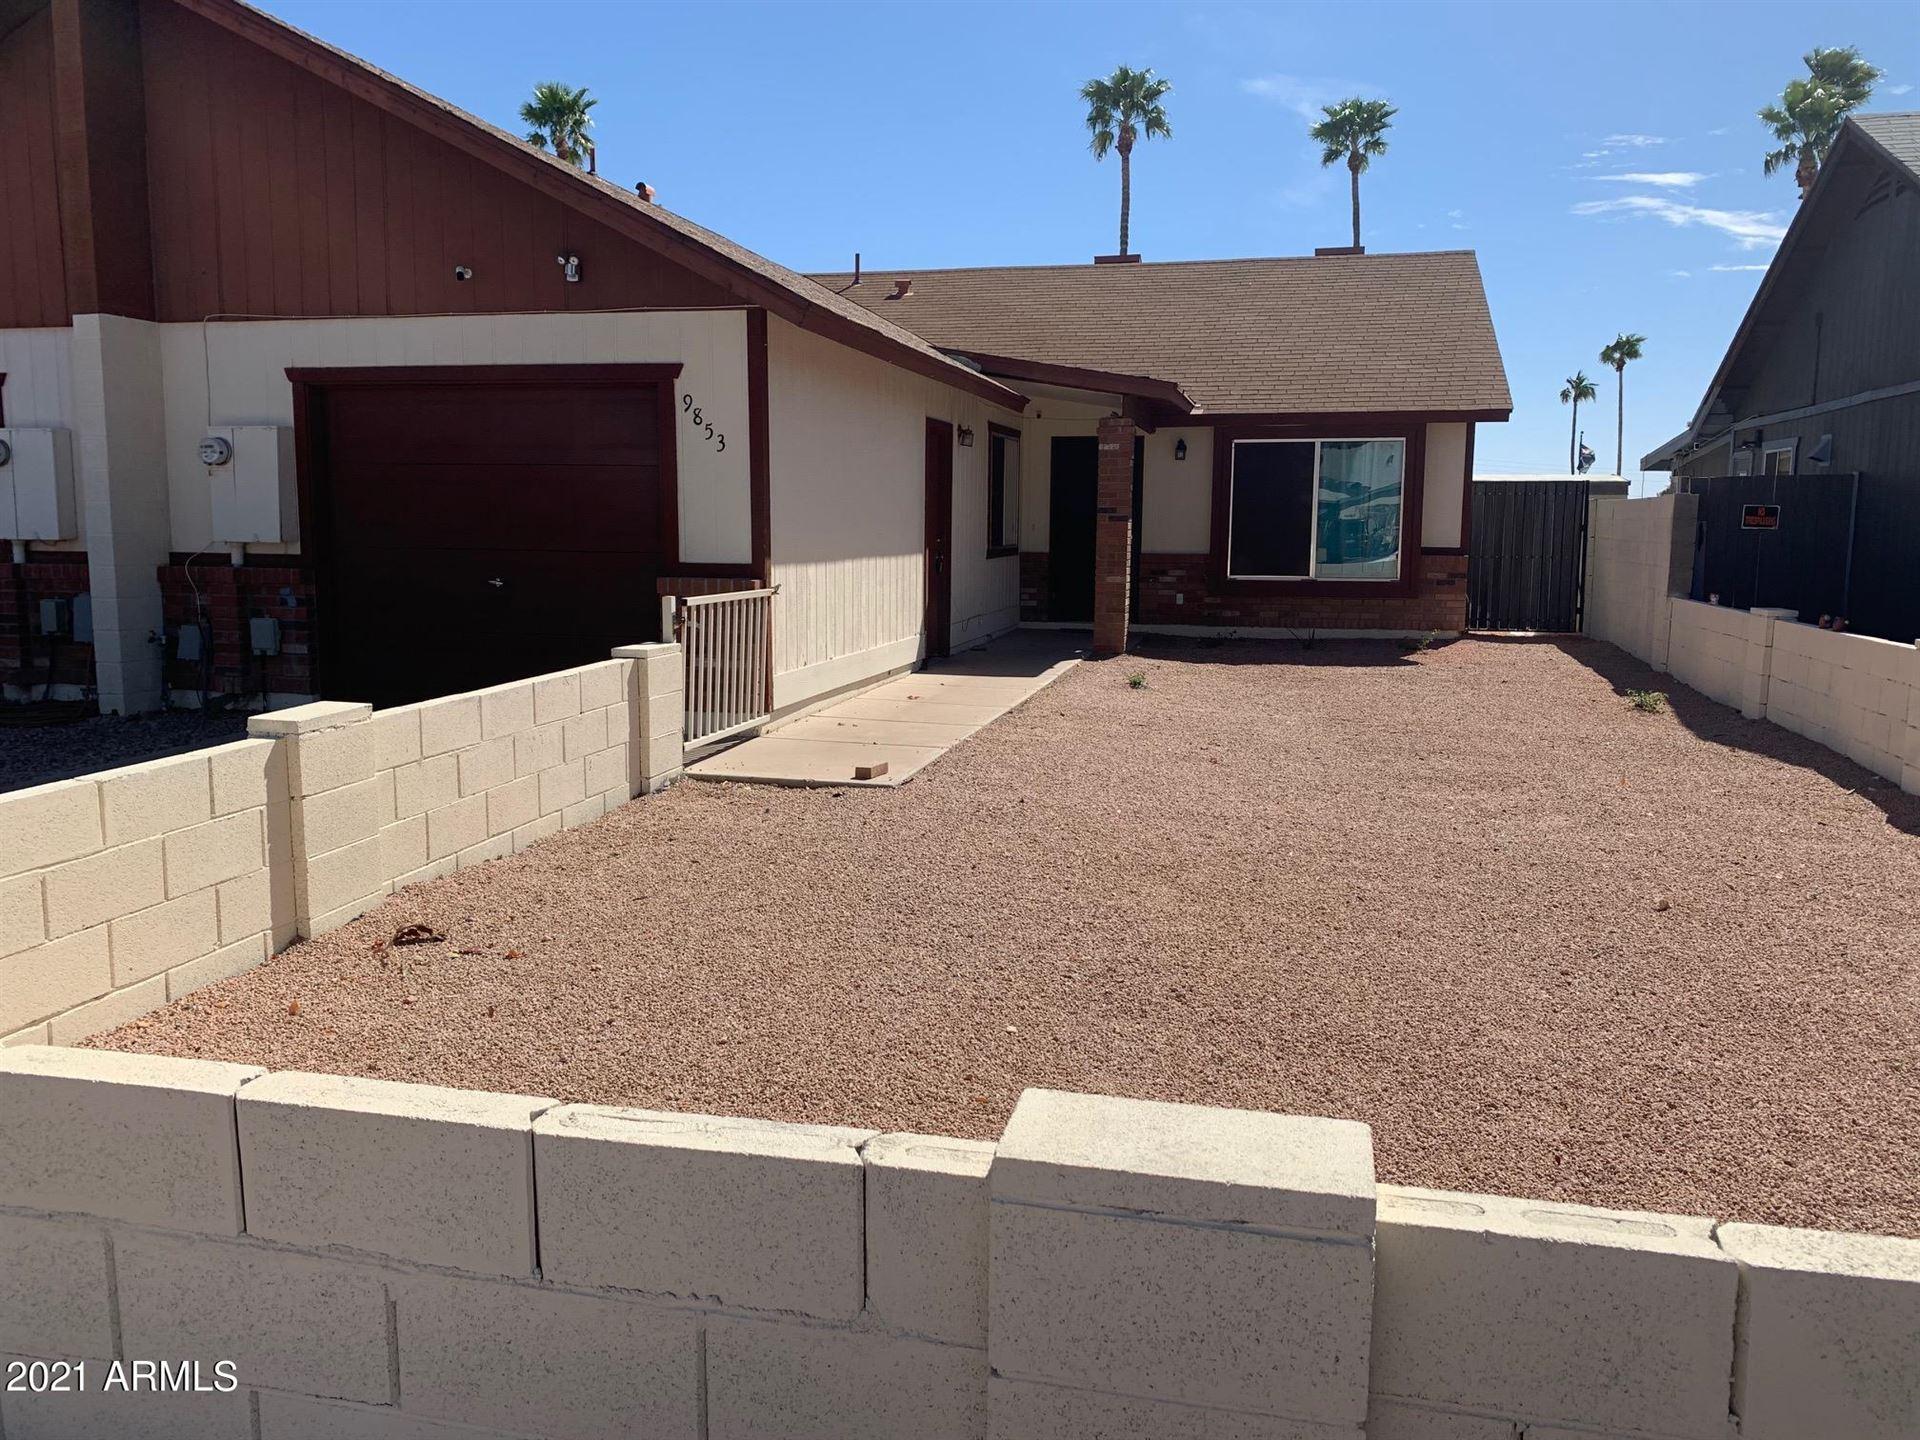 Photo of 9853 E BIRCHWOOD Avenue, Mesa, AZ 85208 (MLS # 6203347)